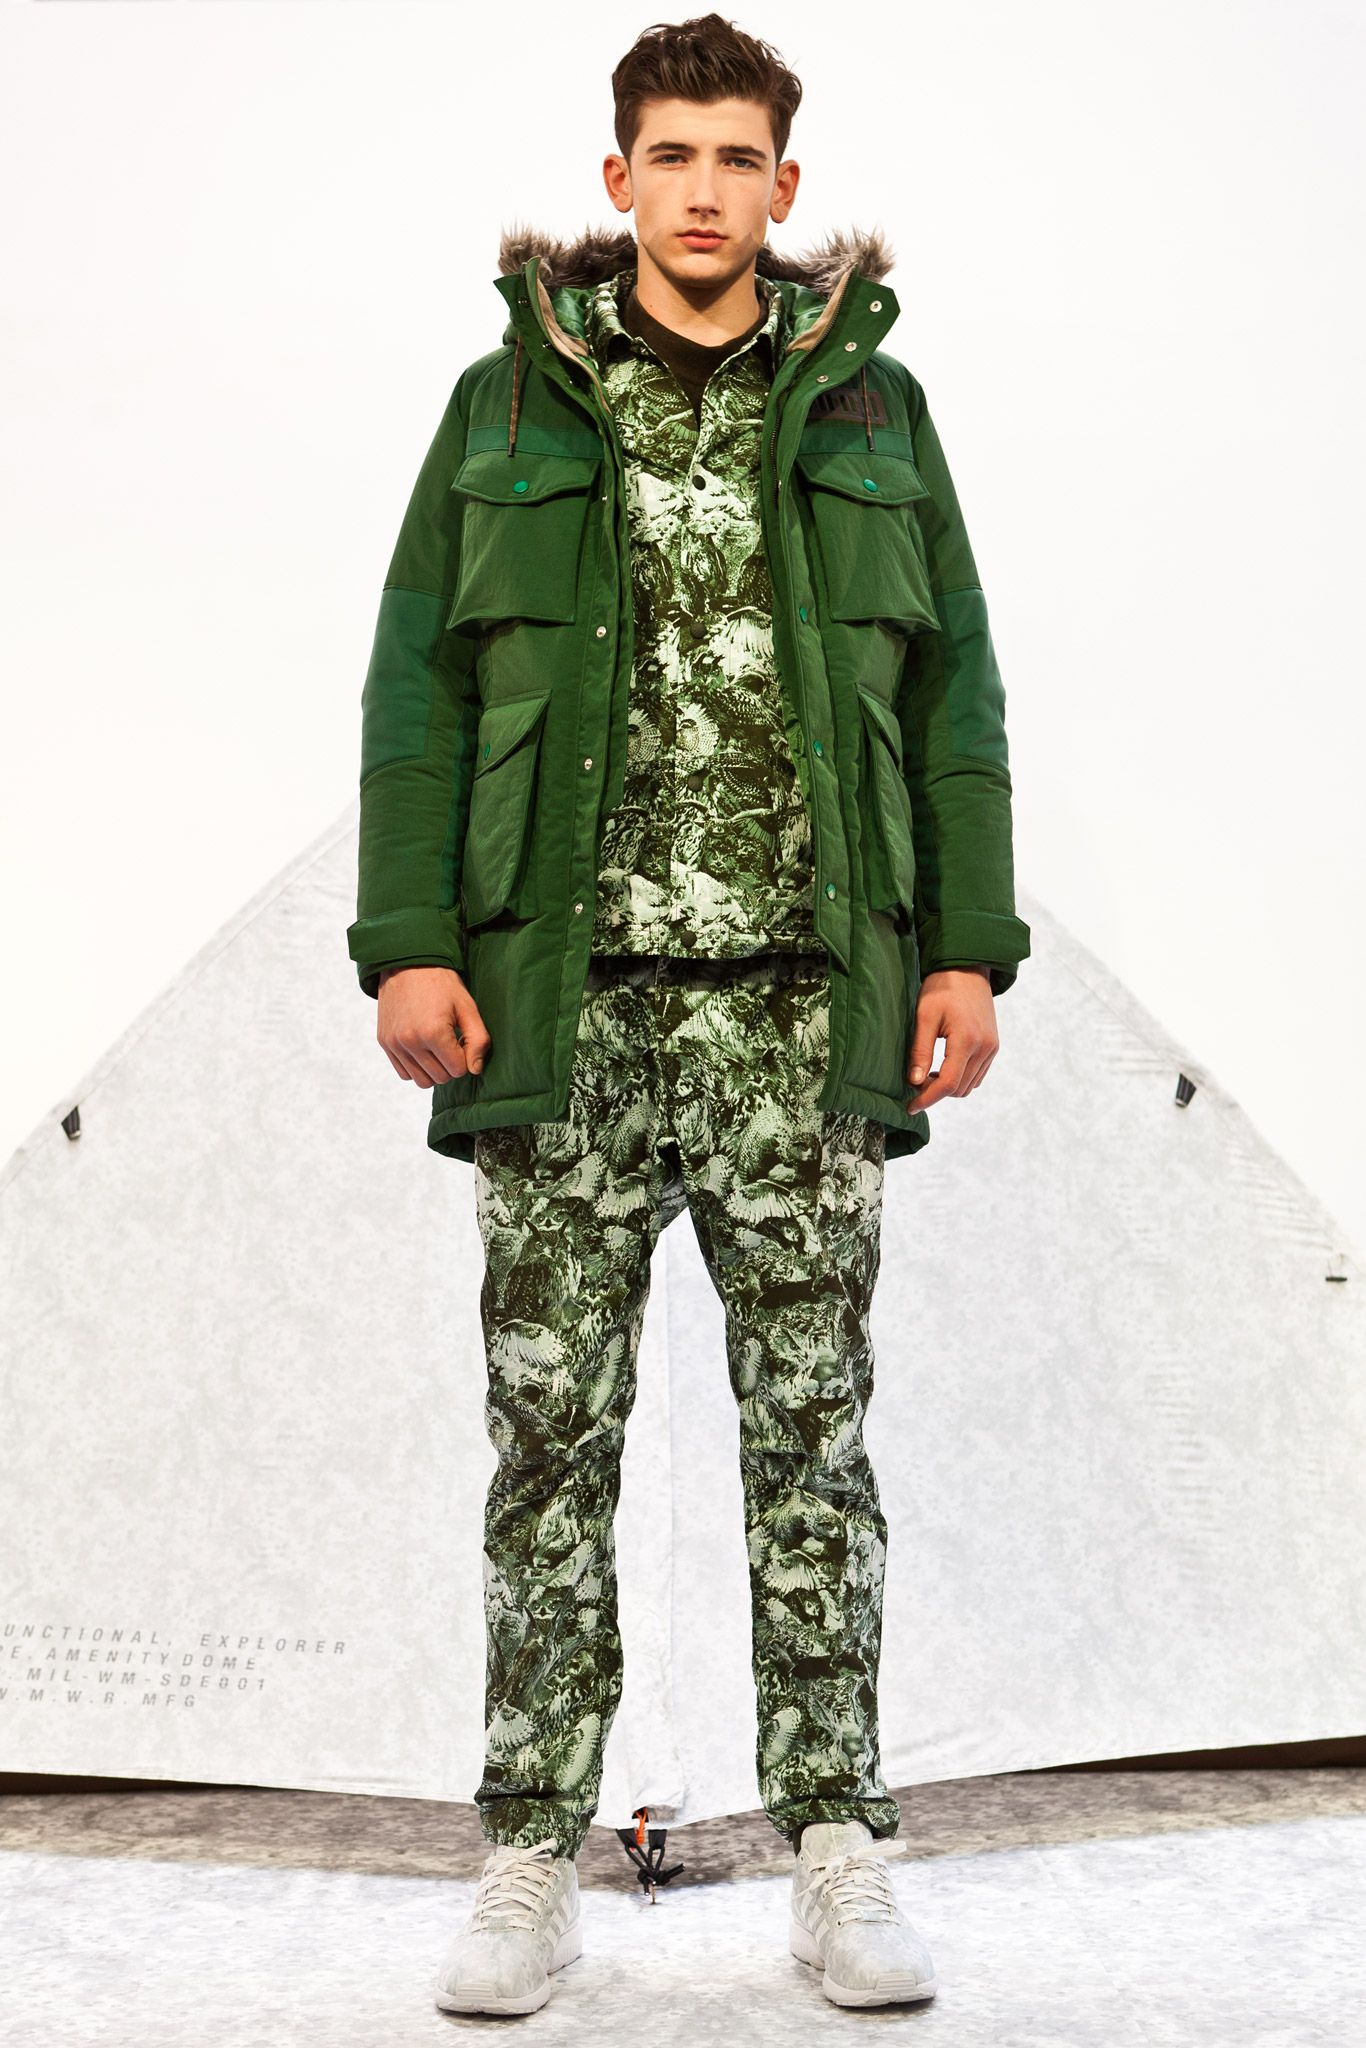 White Mountaineering - Fall 2015 Menswear